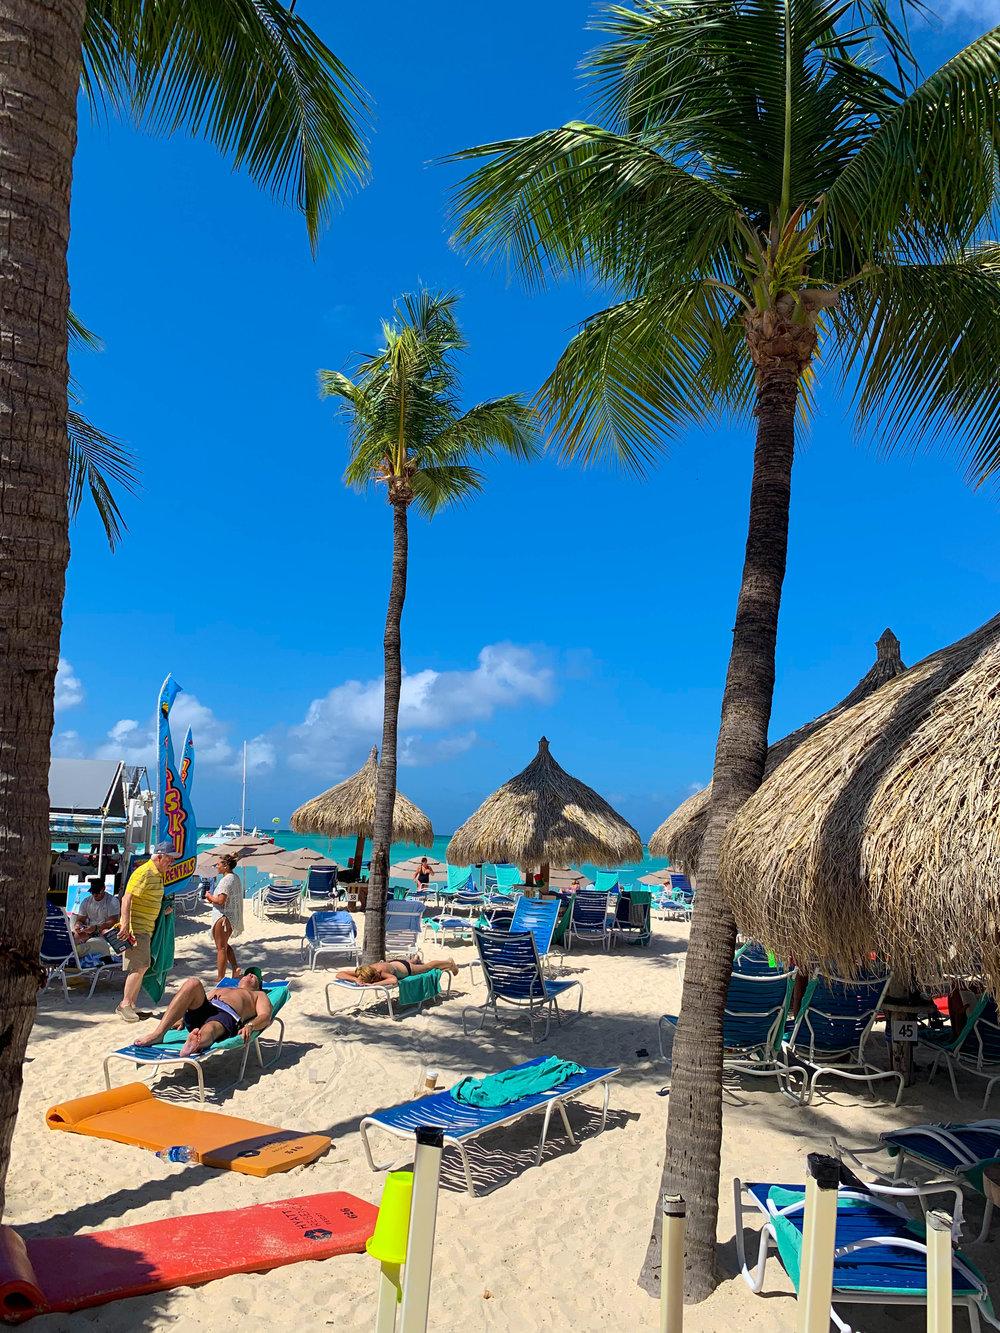 Aruba-Hyatt-Regency-Beach.jpg